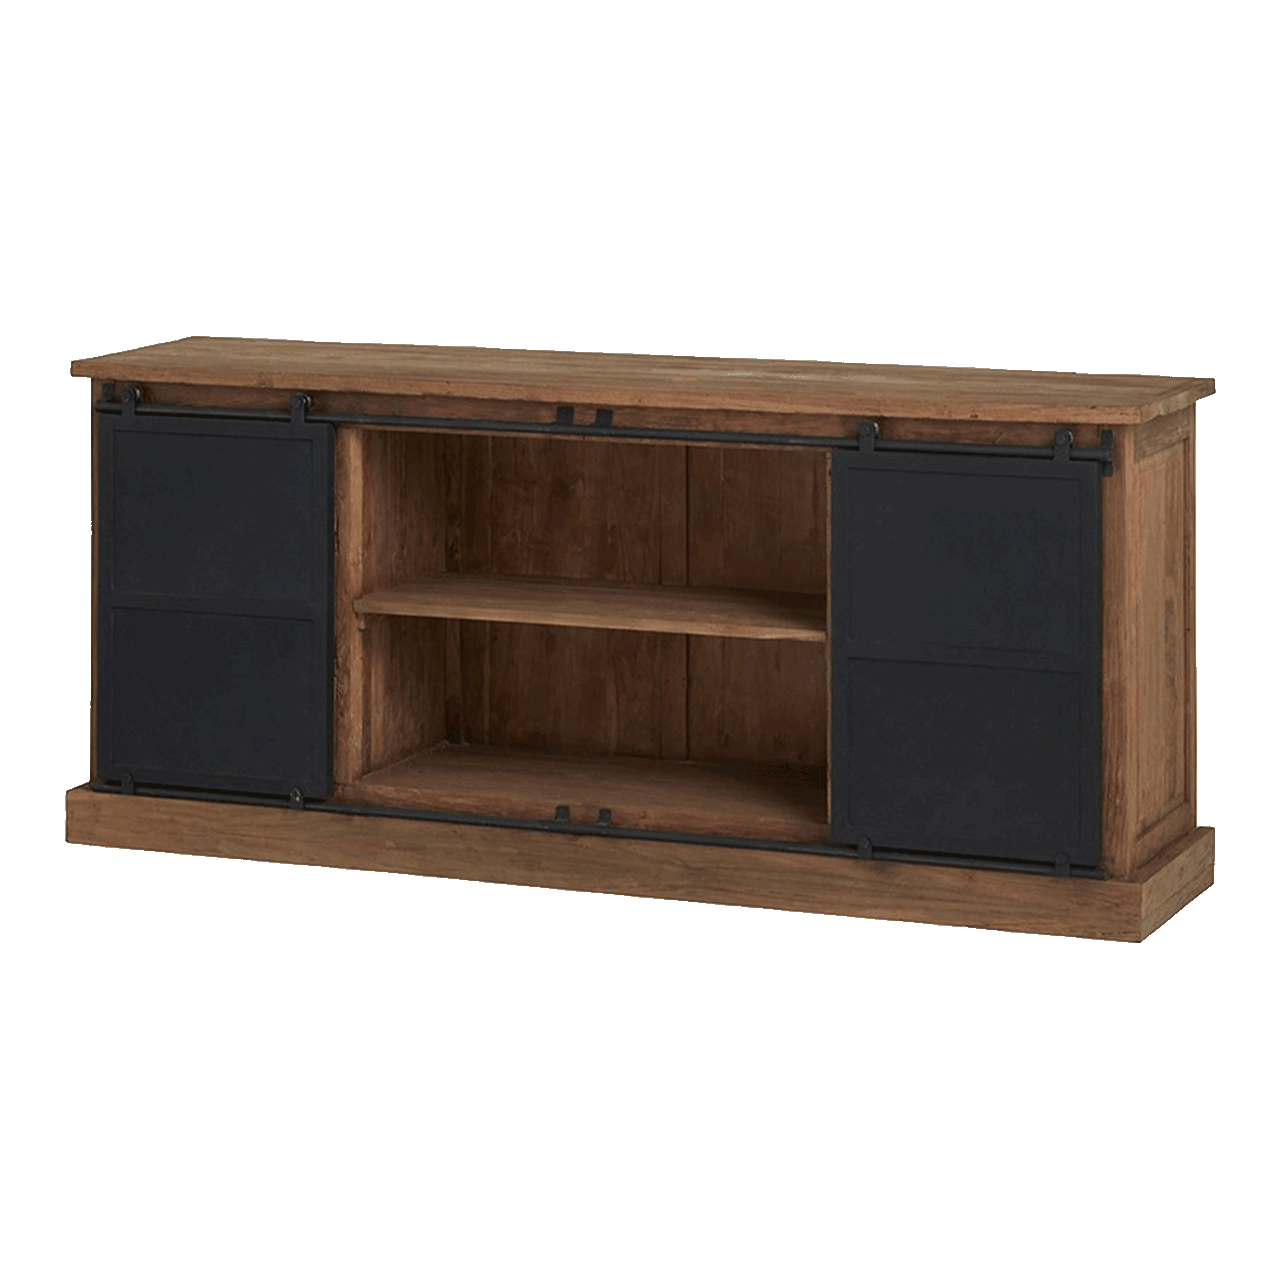 skurios® Original Sideboard